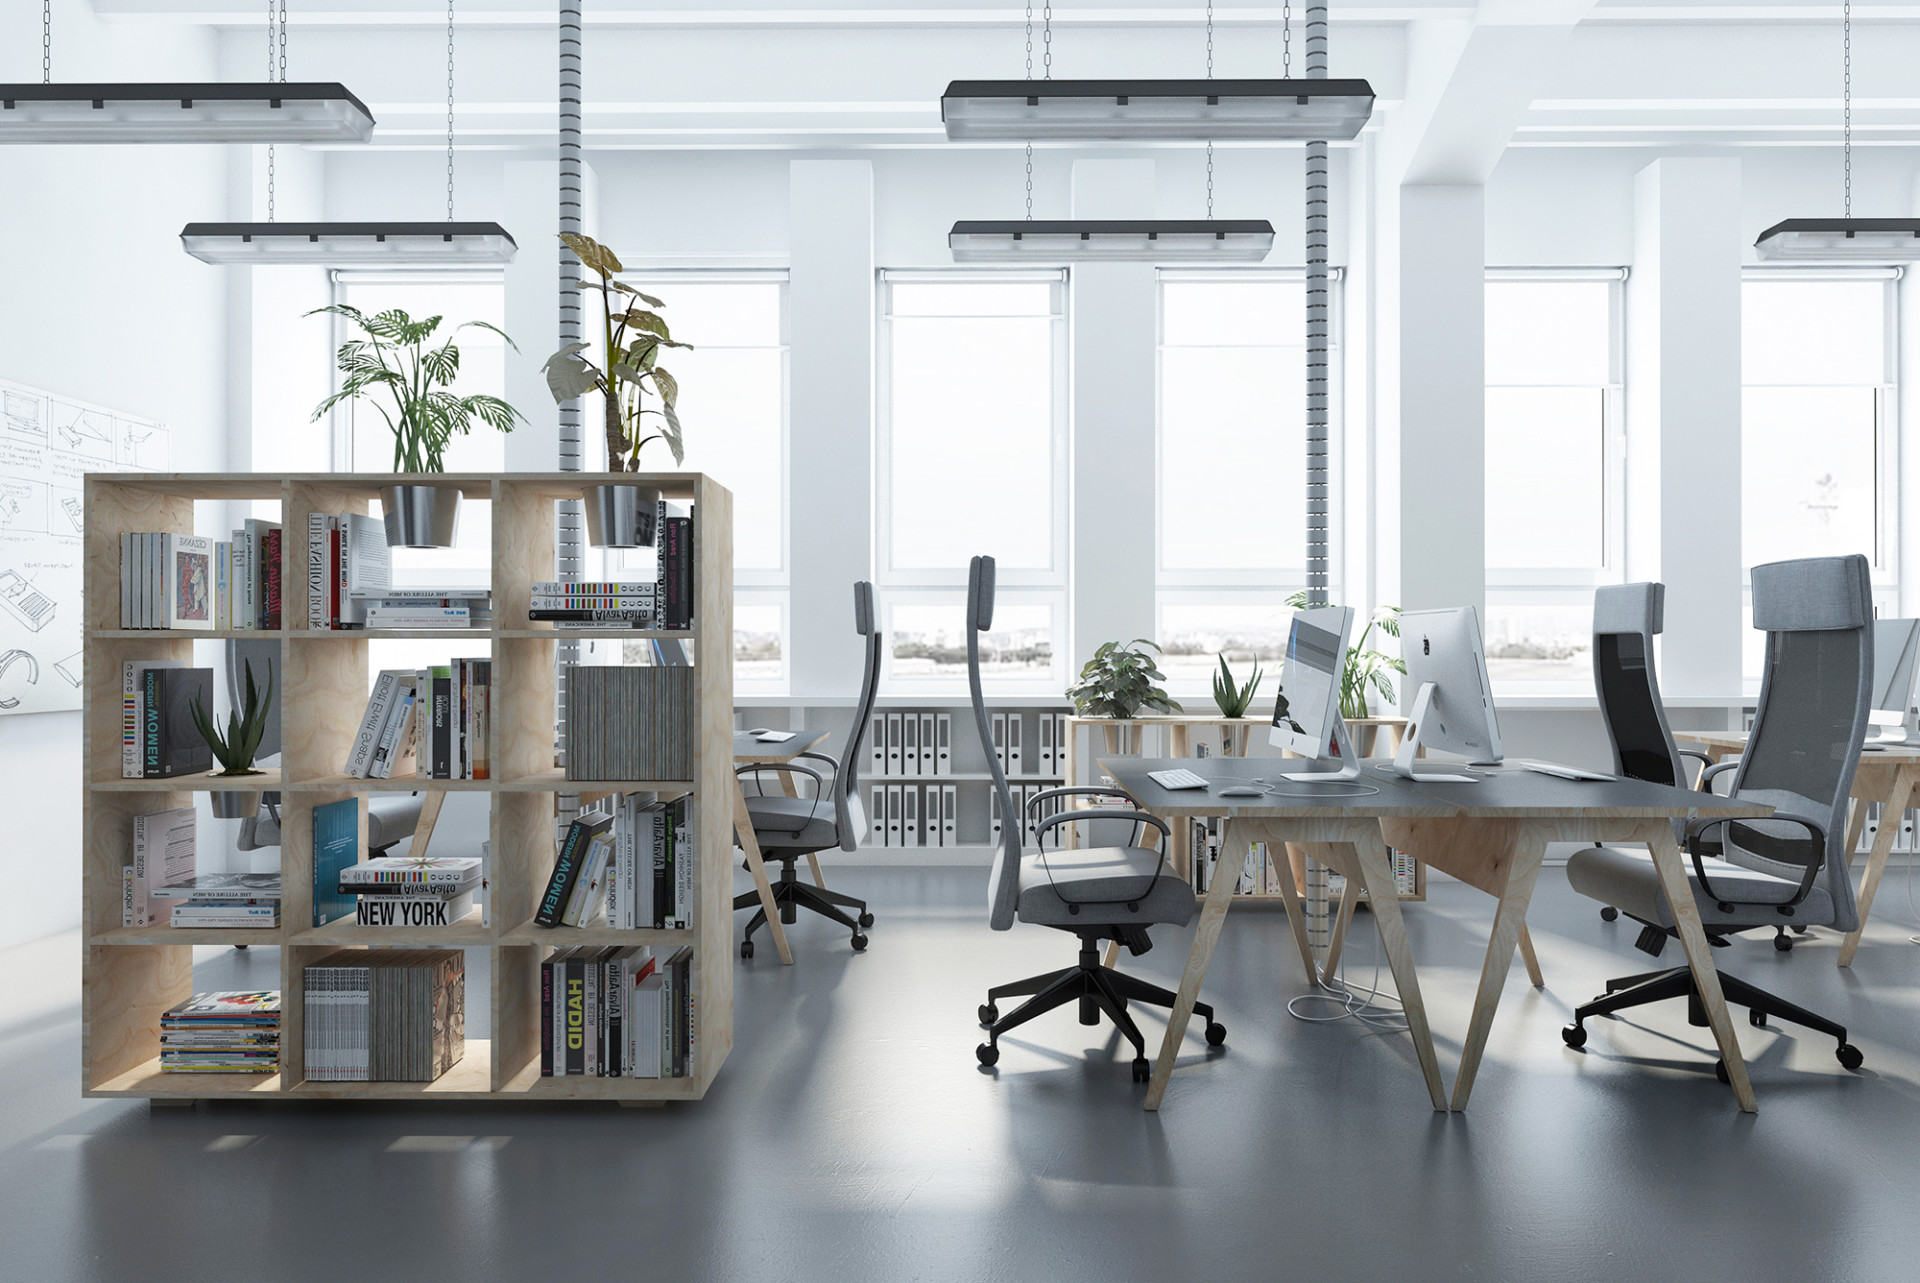 Kint Studio Biuro Redkroft